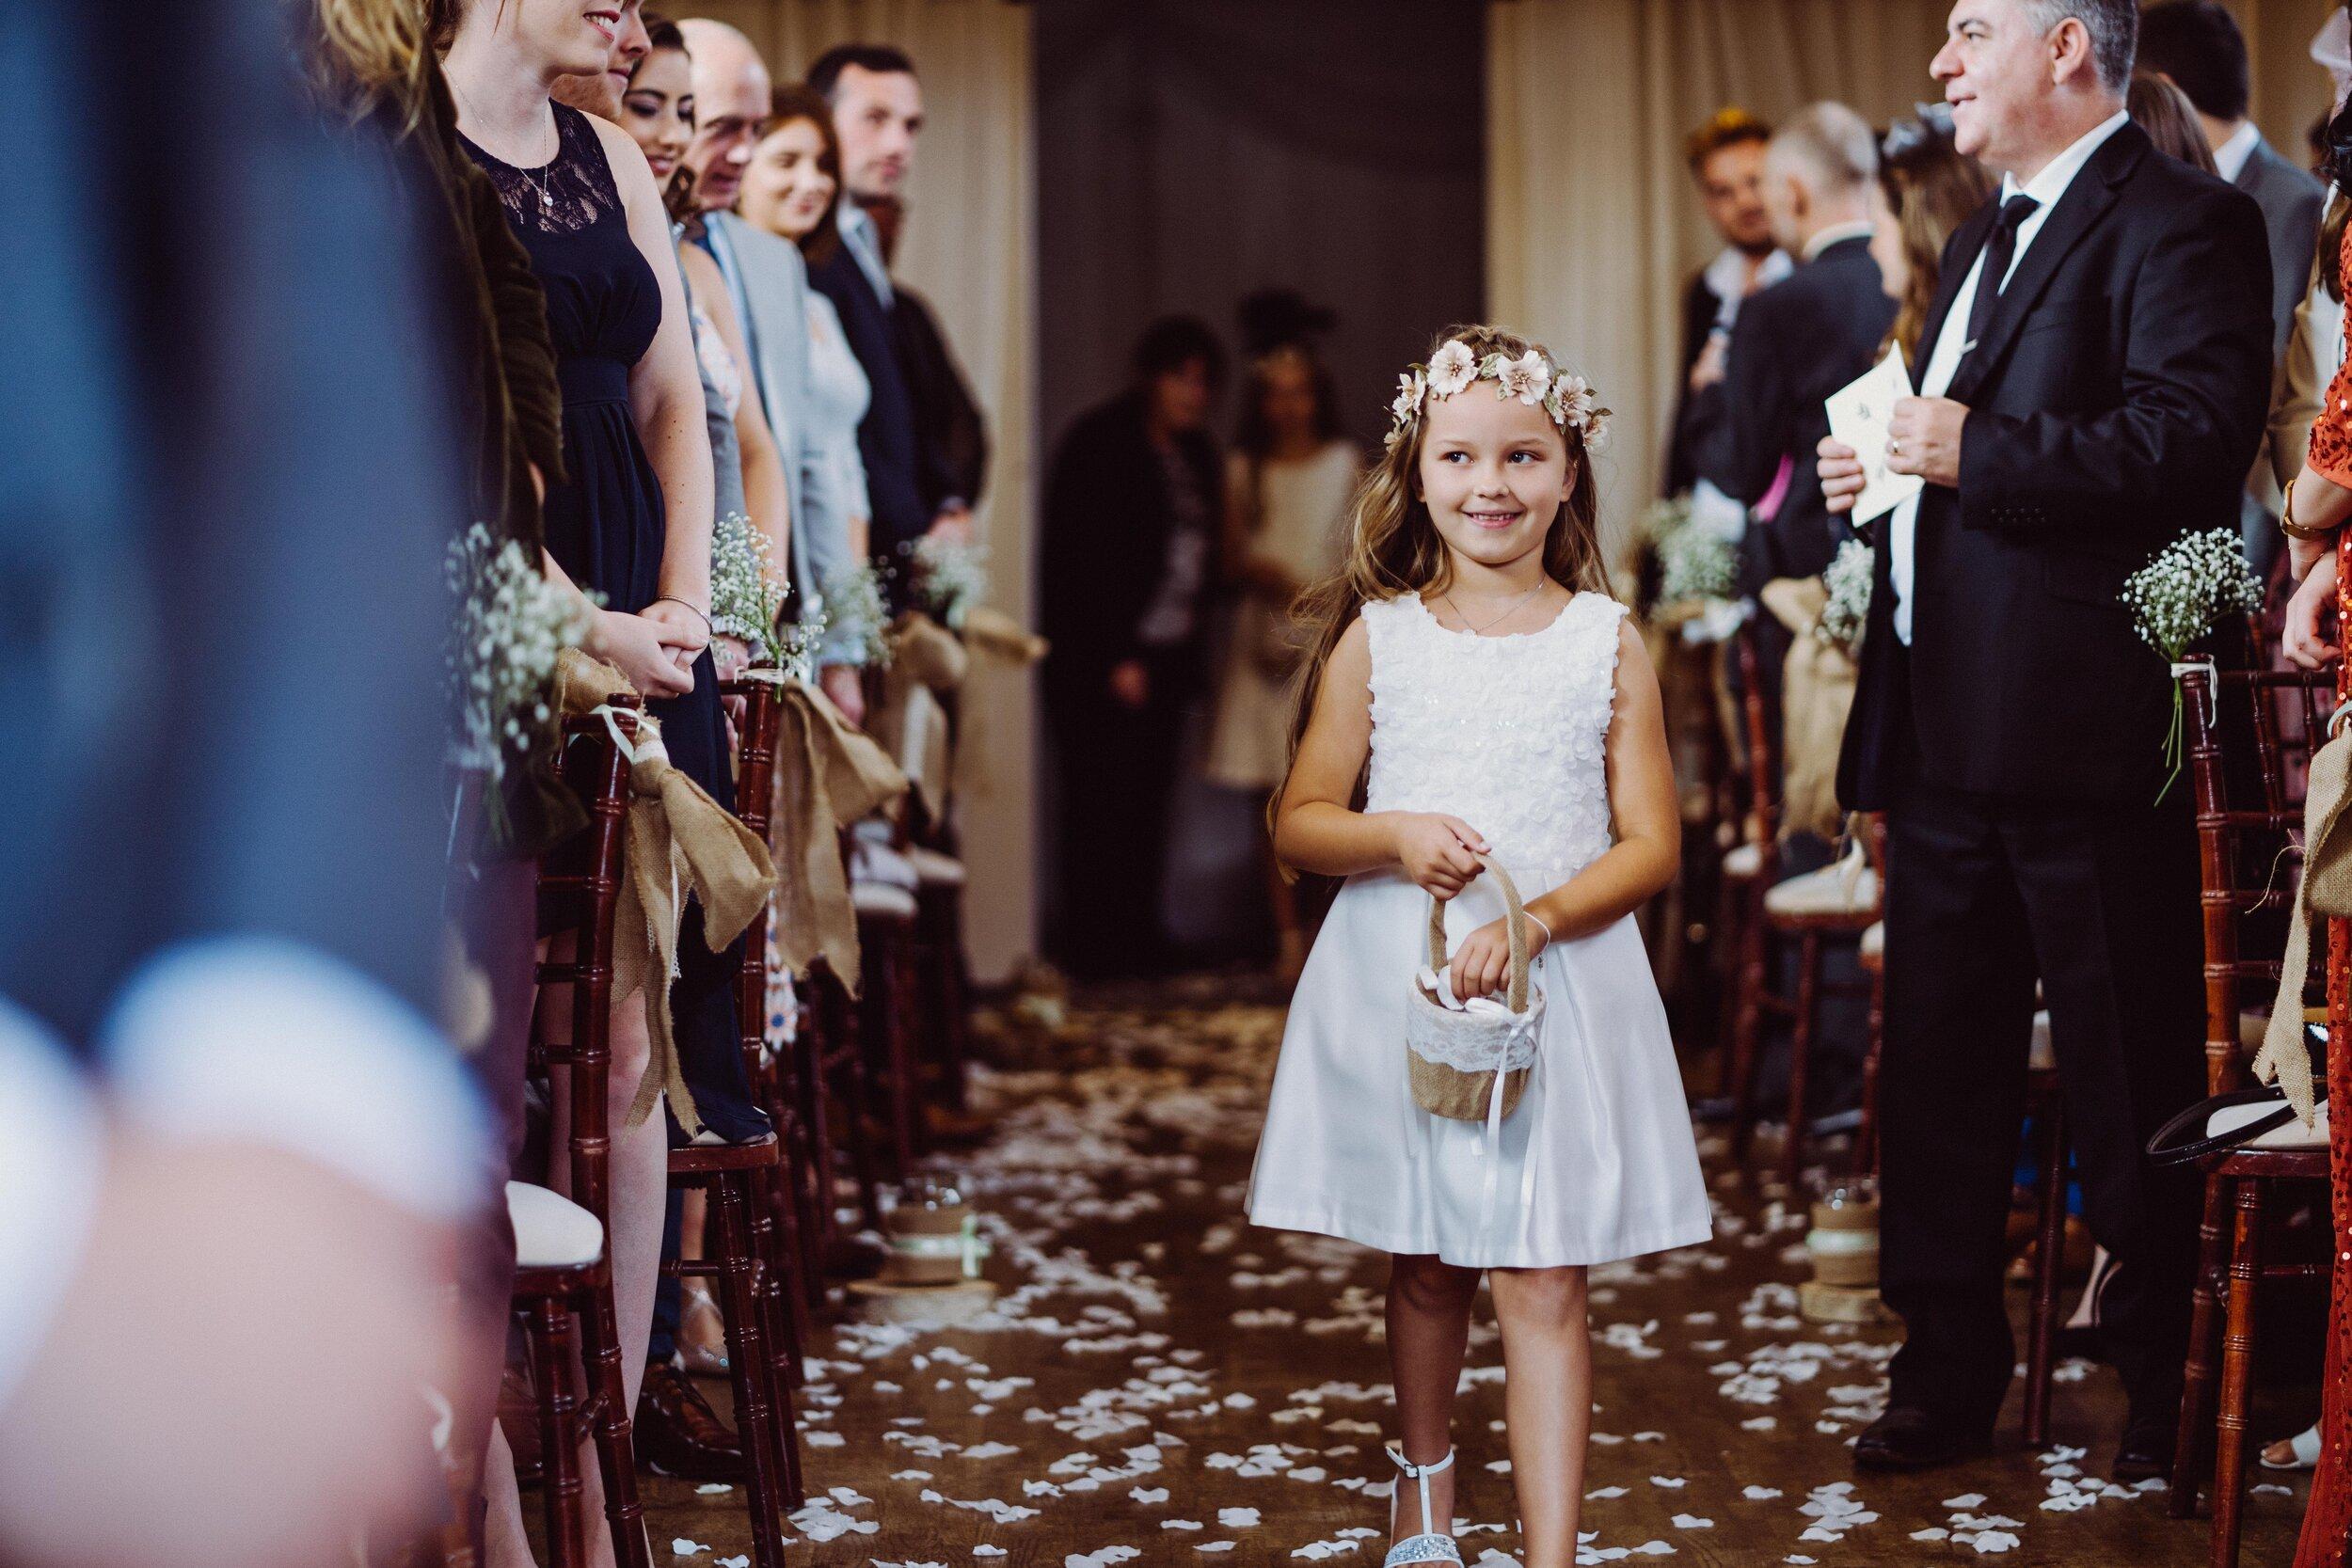 kent-wedding-photographer-101538.jpg